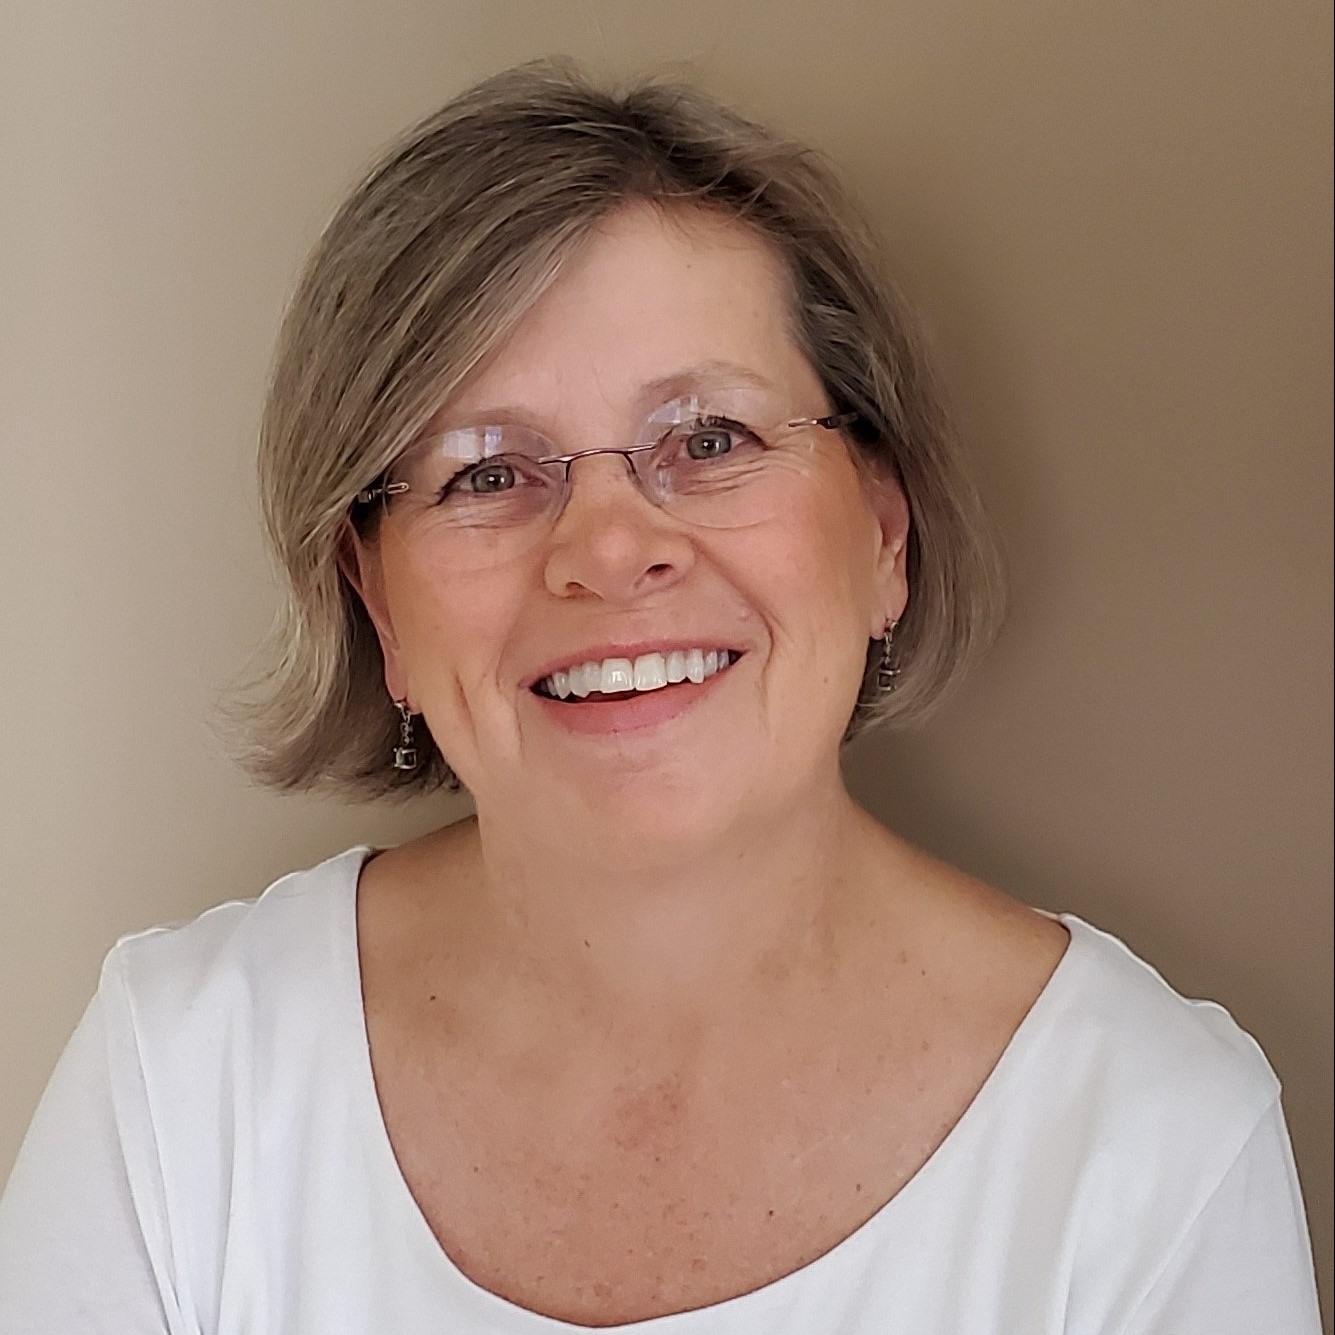 Image of Teresa Otto